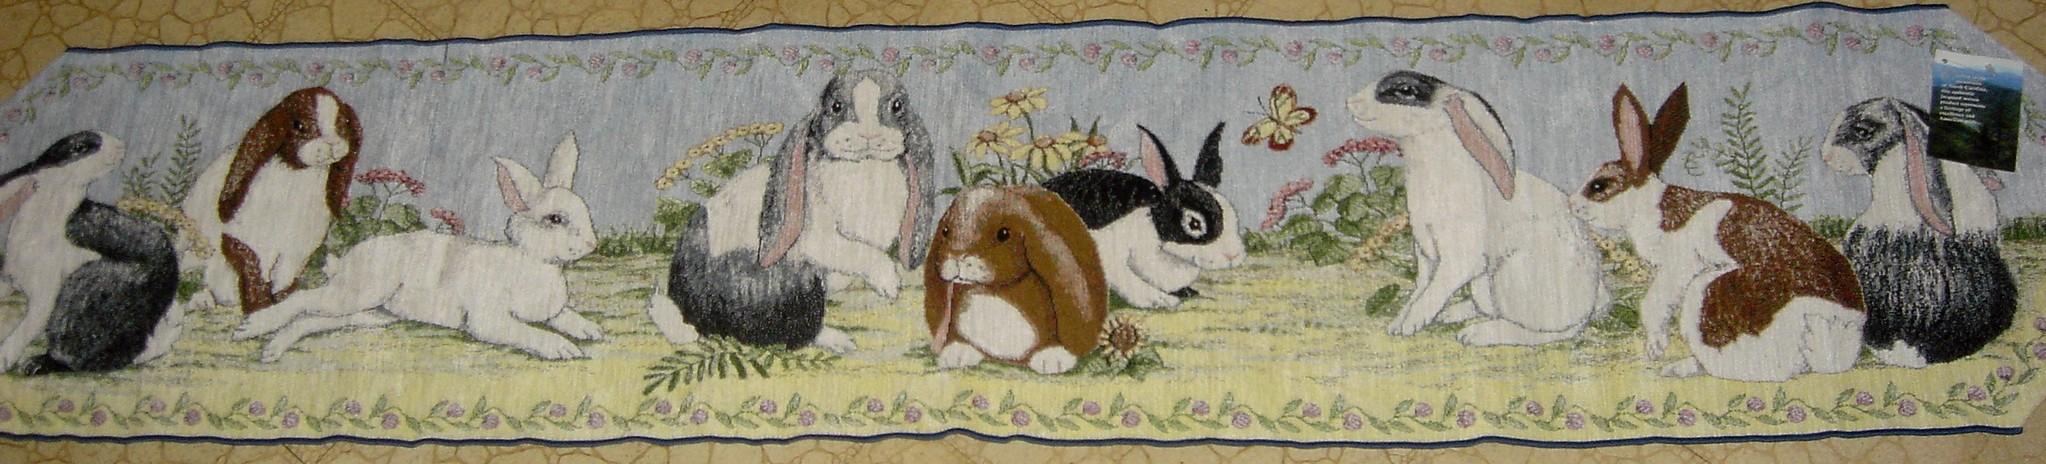 Bunnyrabbit Com Rabbit Home Decor Bunny Home Decor